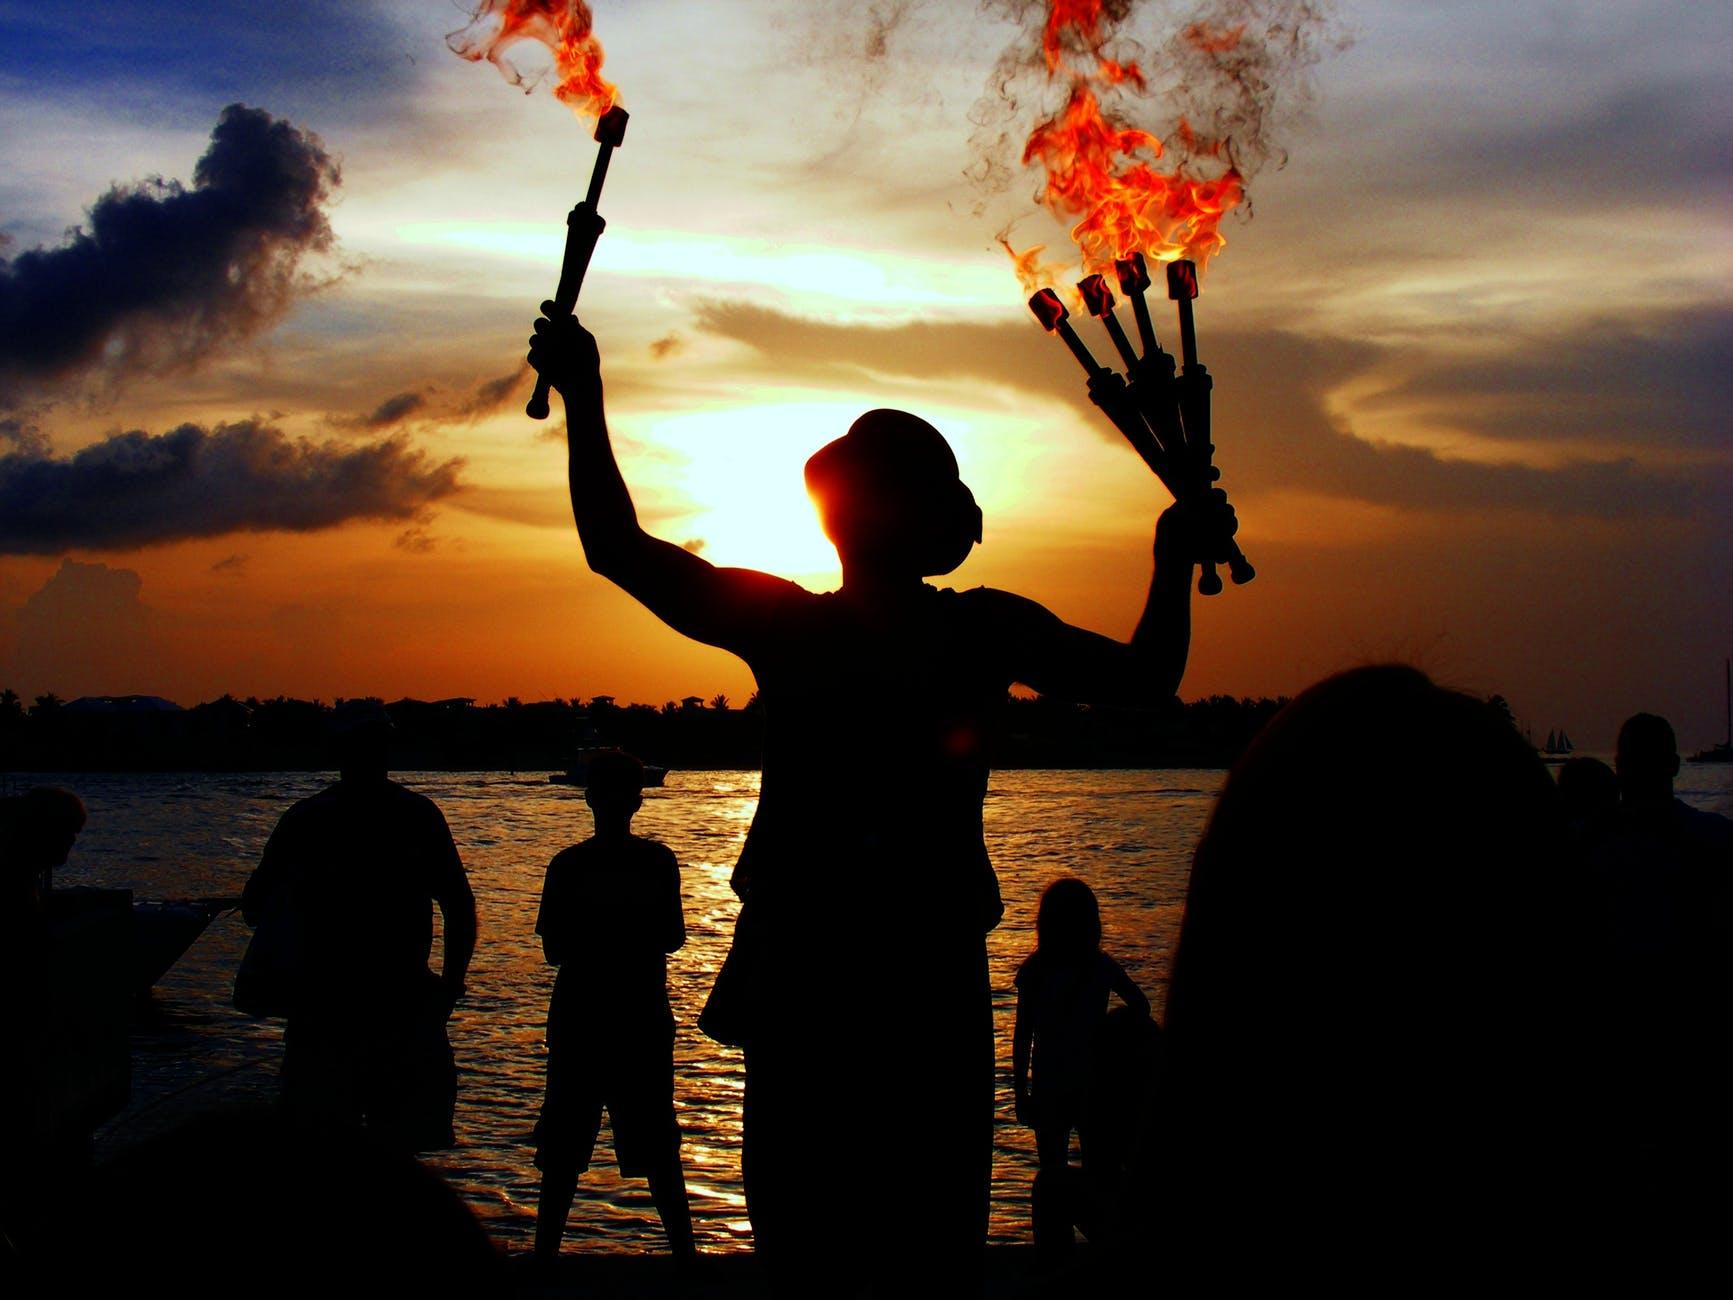 juggler-performer-water-sea-65297.jpeg